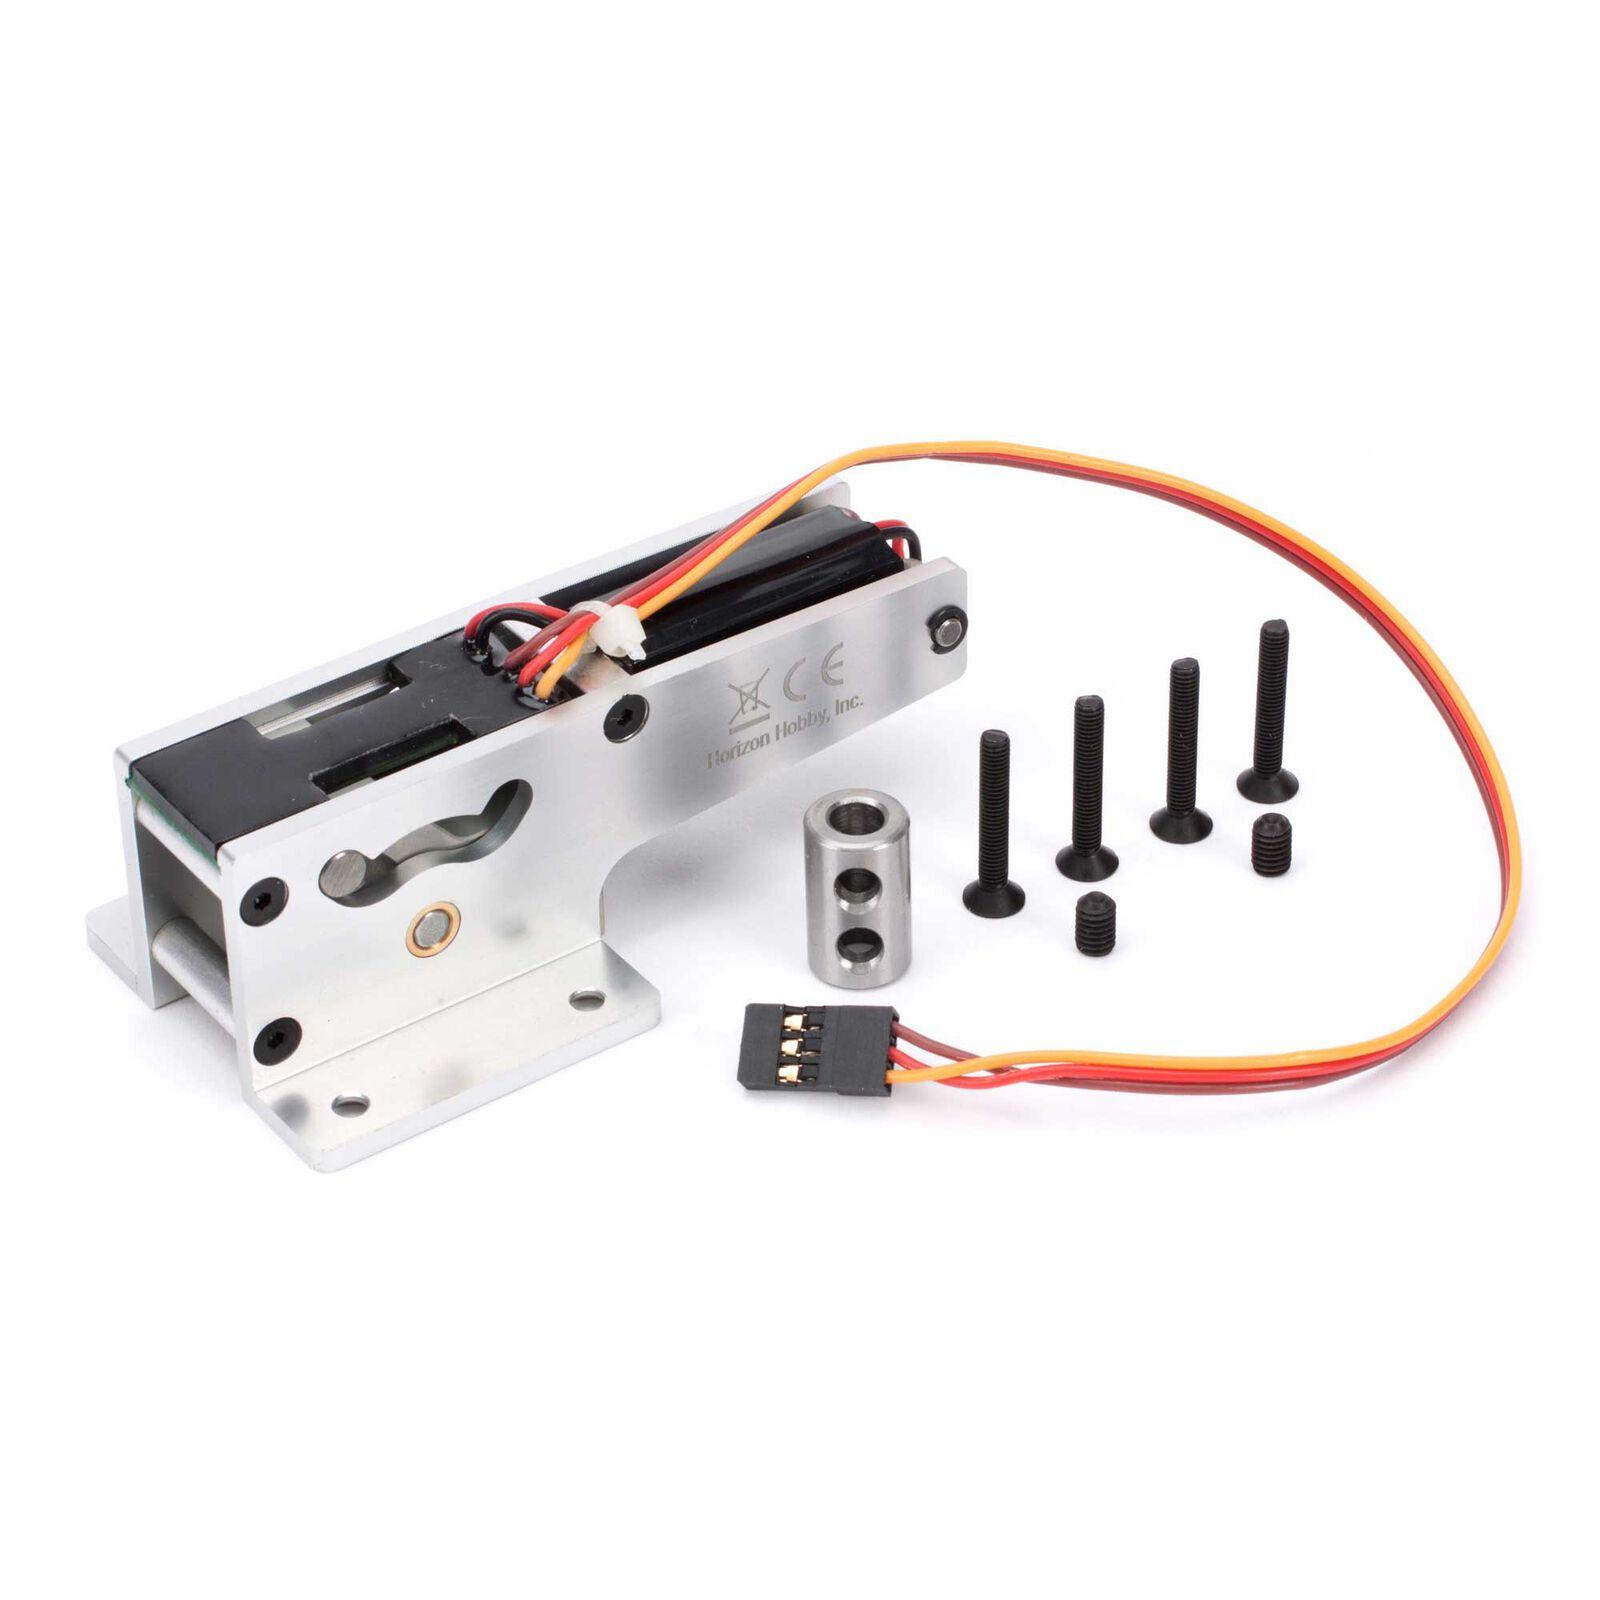 60 - 120 81-Degree Strut-Ready Main Electric Retract Unit